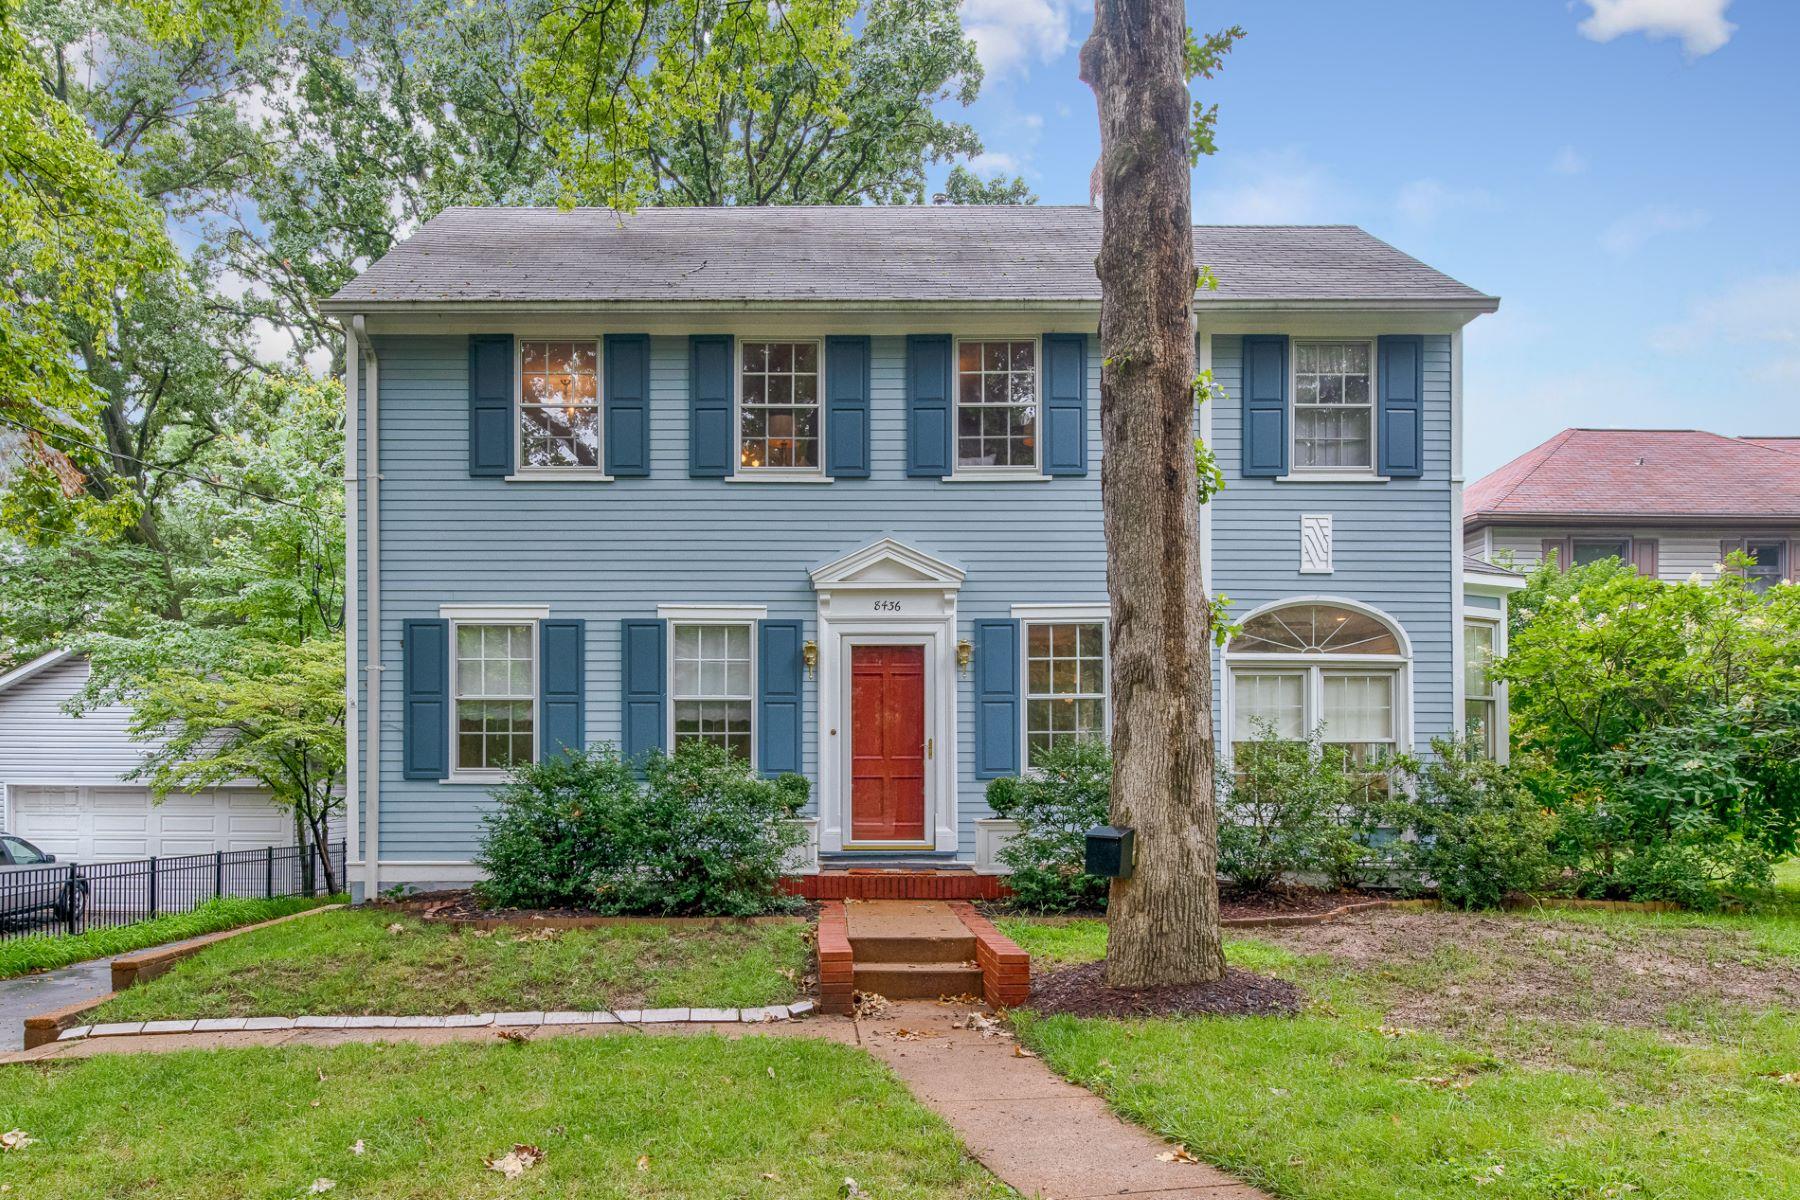 Single Family Home for Sale at Big Bend Blvd 8436 Big Bend Blvd St. Louis, Missouri 63119 United States